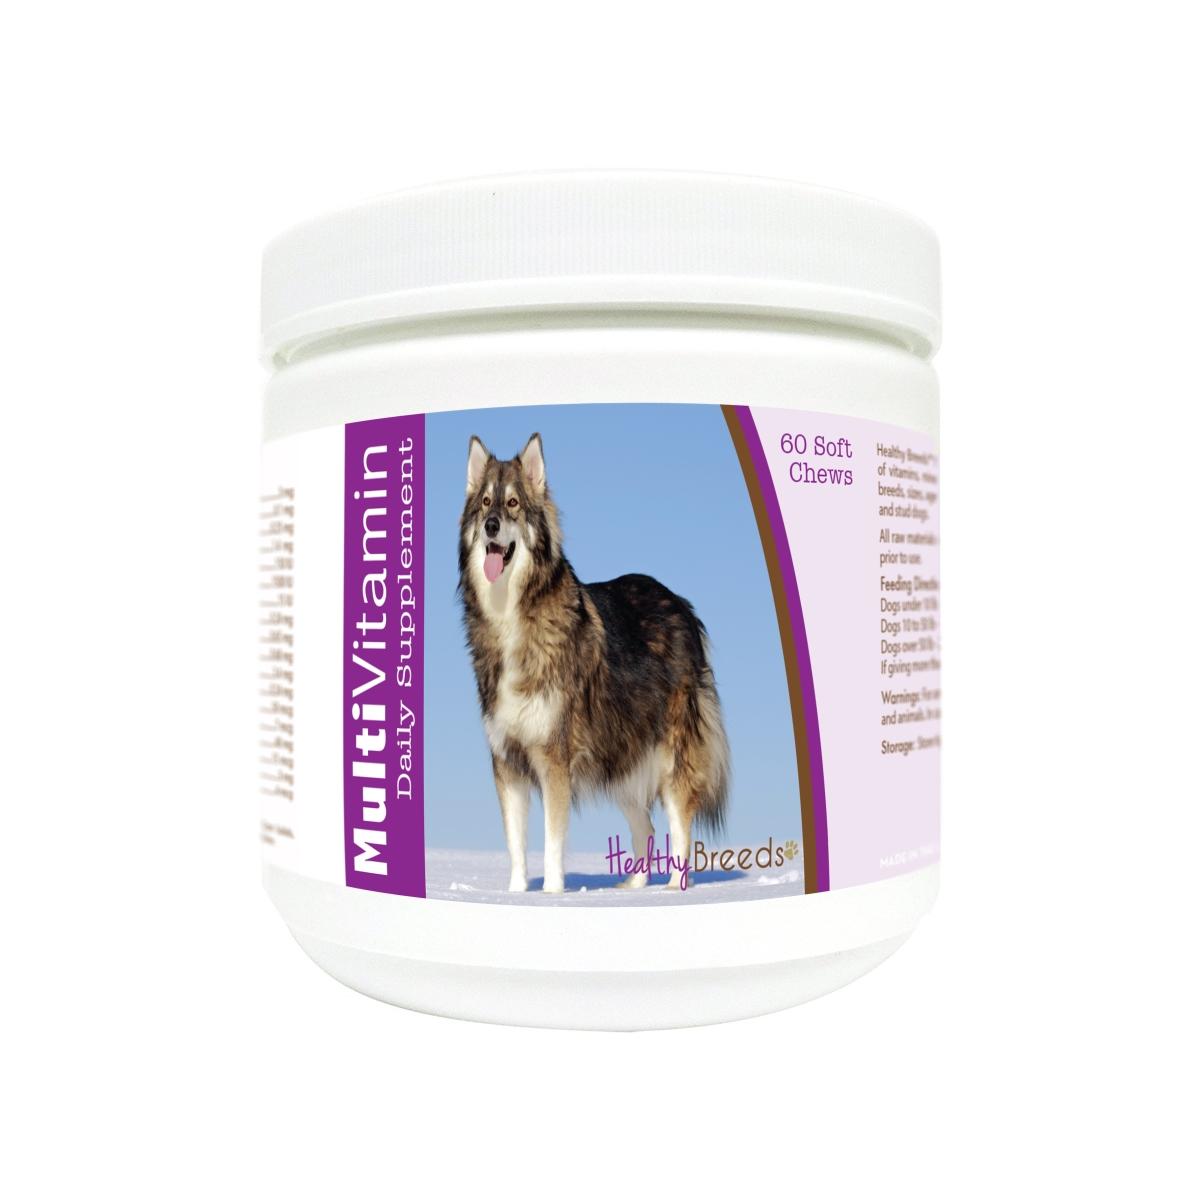 Healthy Breeds 840235177746 Utonagan Multi-Vitamin Soft Chews - 60 Count